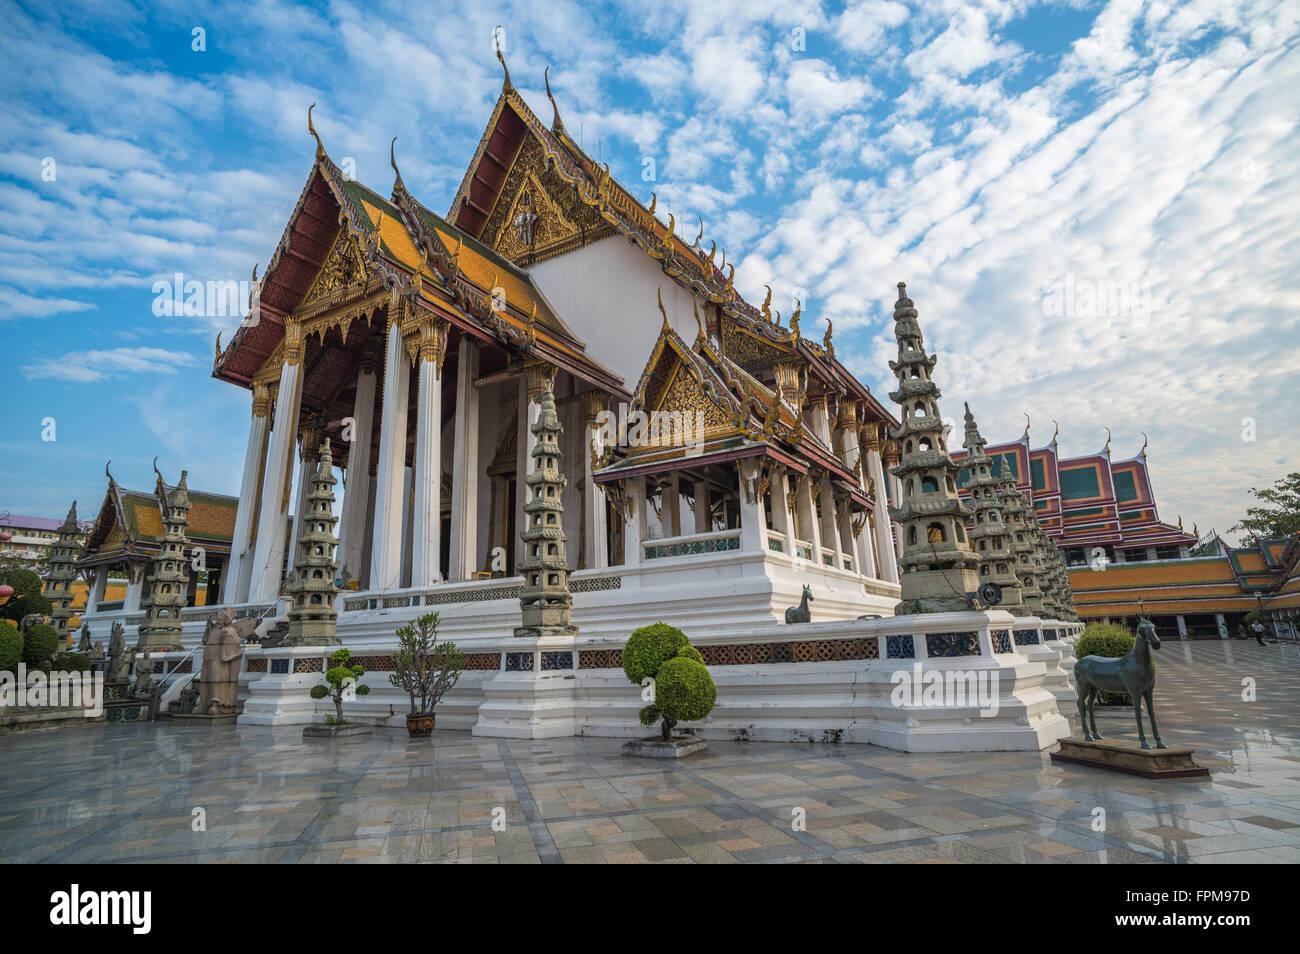 Wat Suthat templo en Bangkok, Tailandia Imagen De Stock